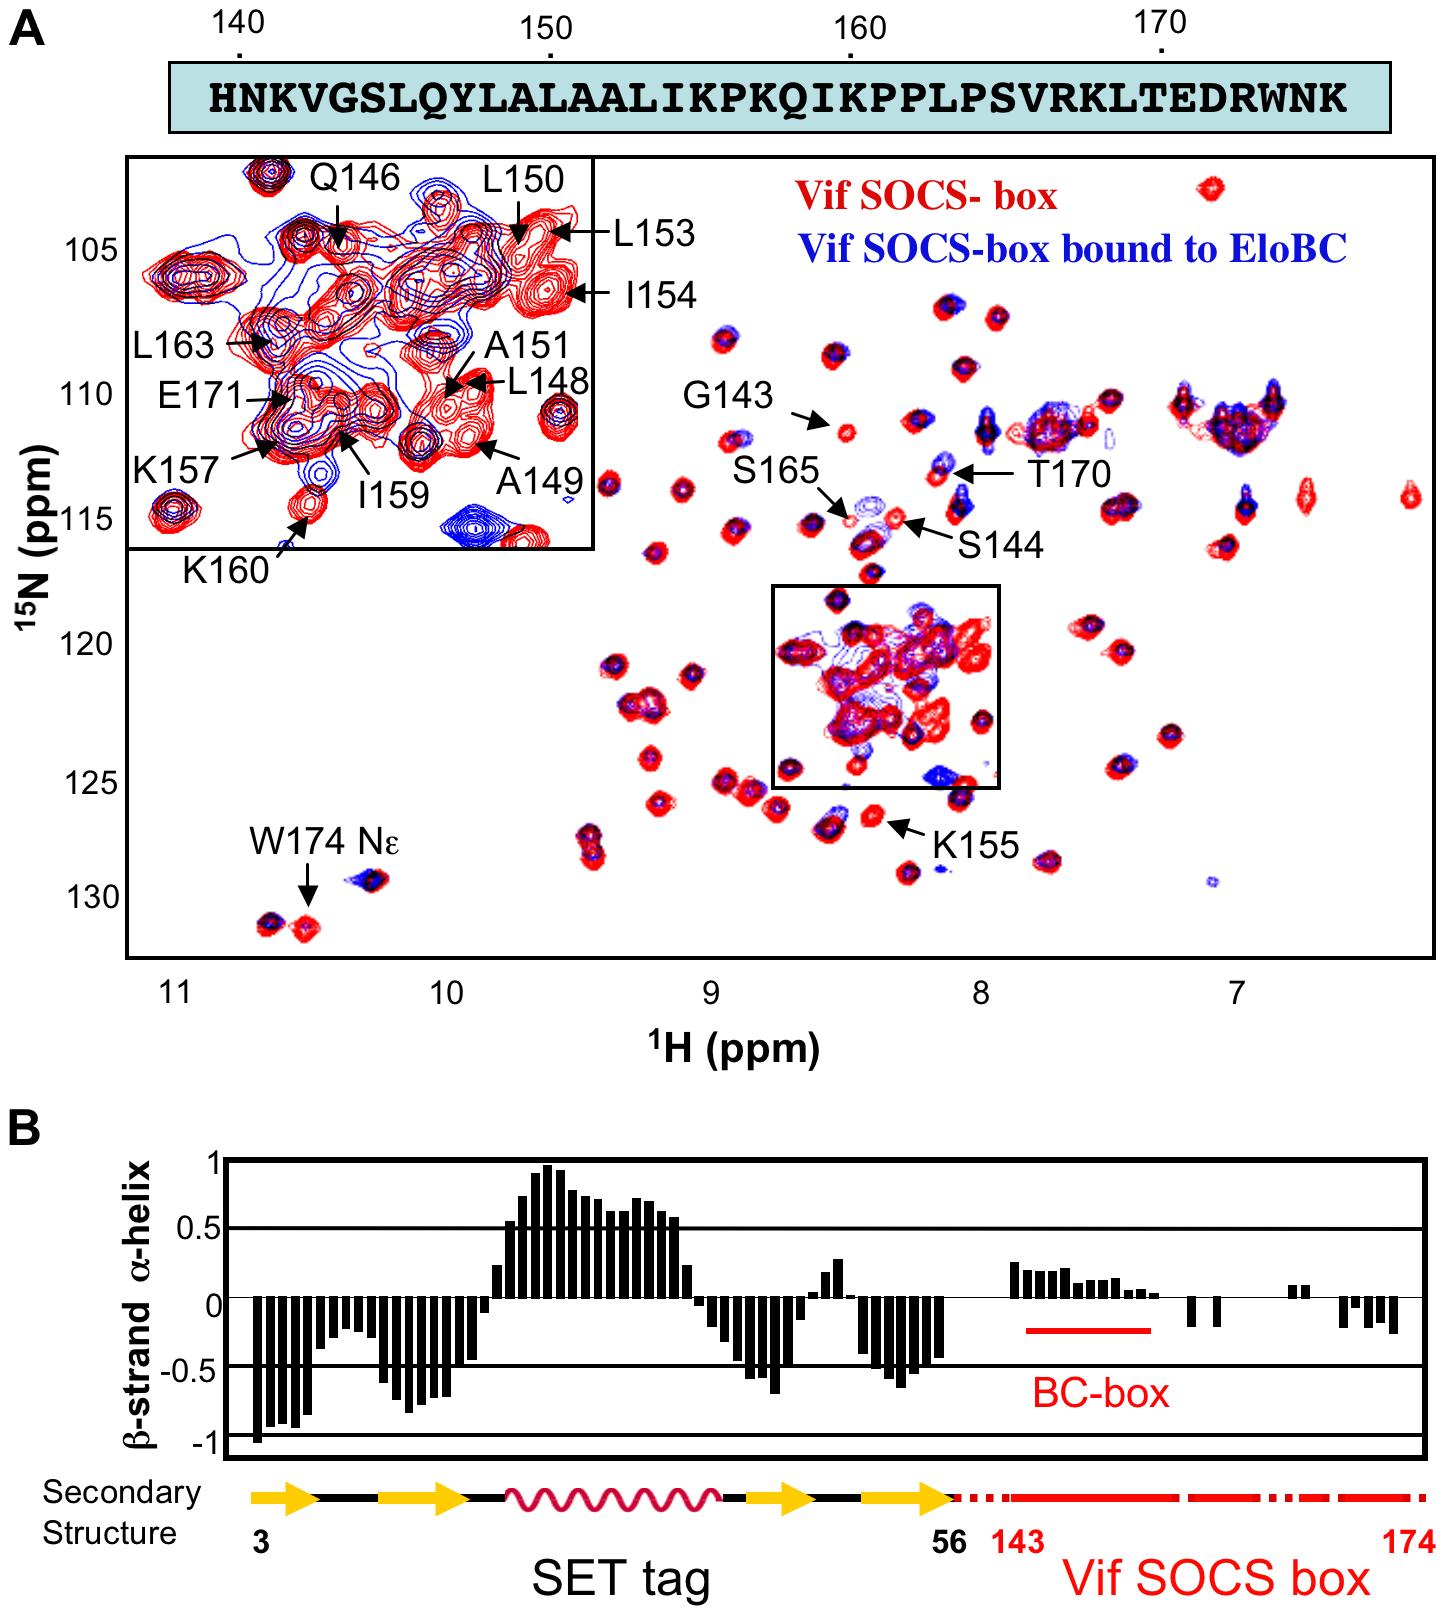 NMR spectroscopy of the Vif SOCS-box.